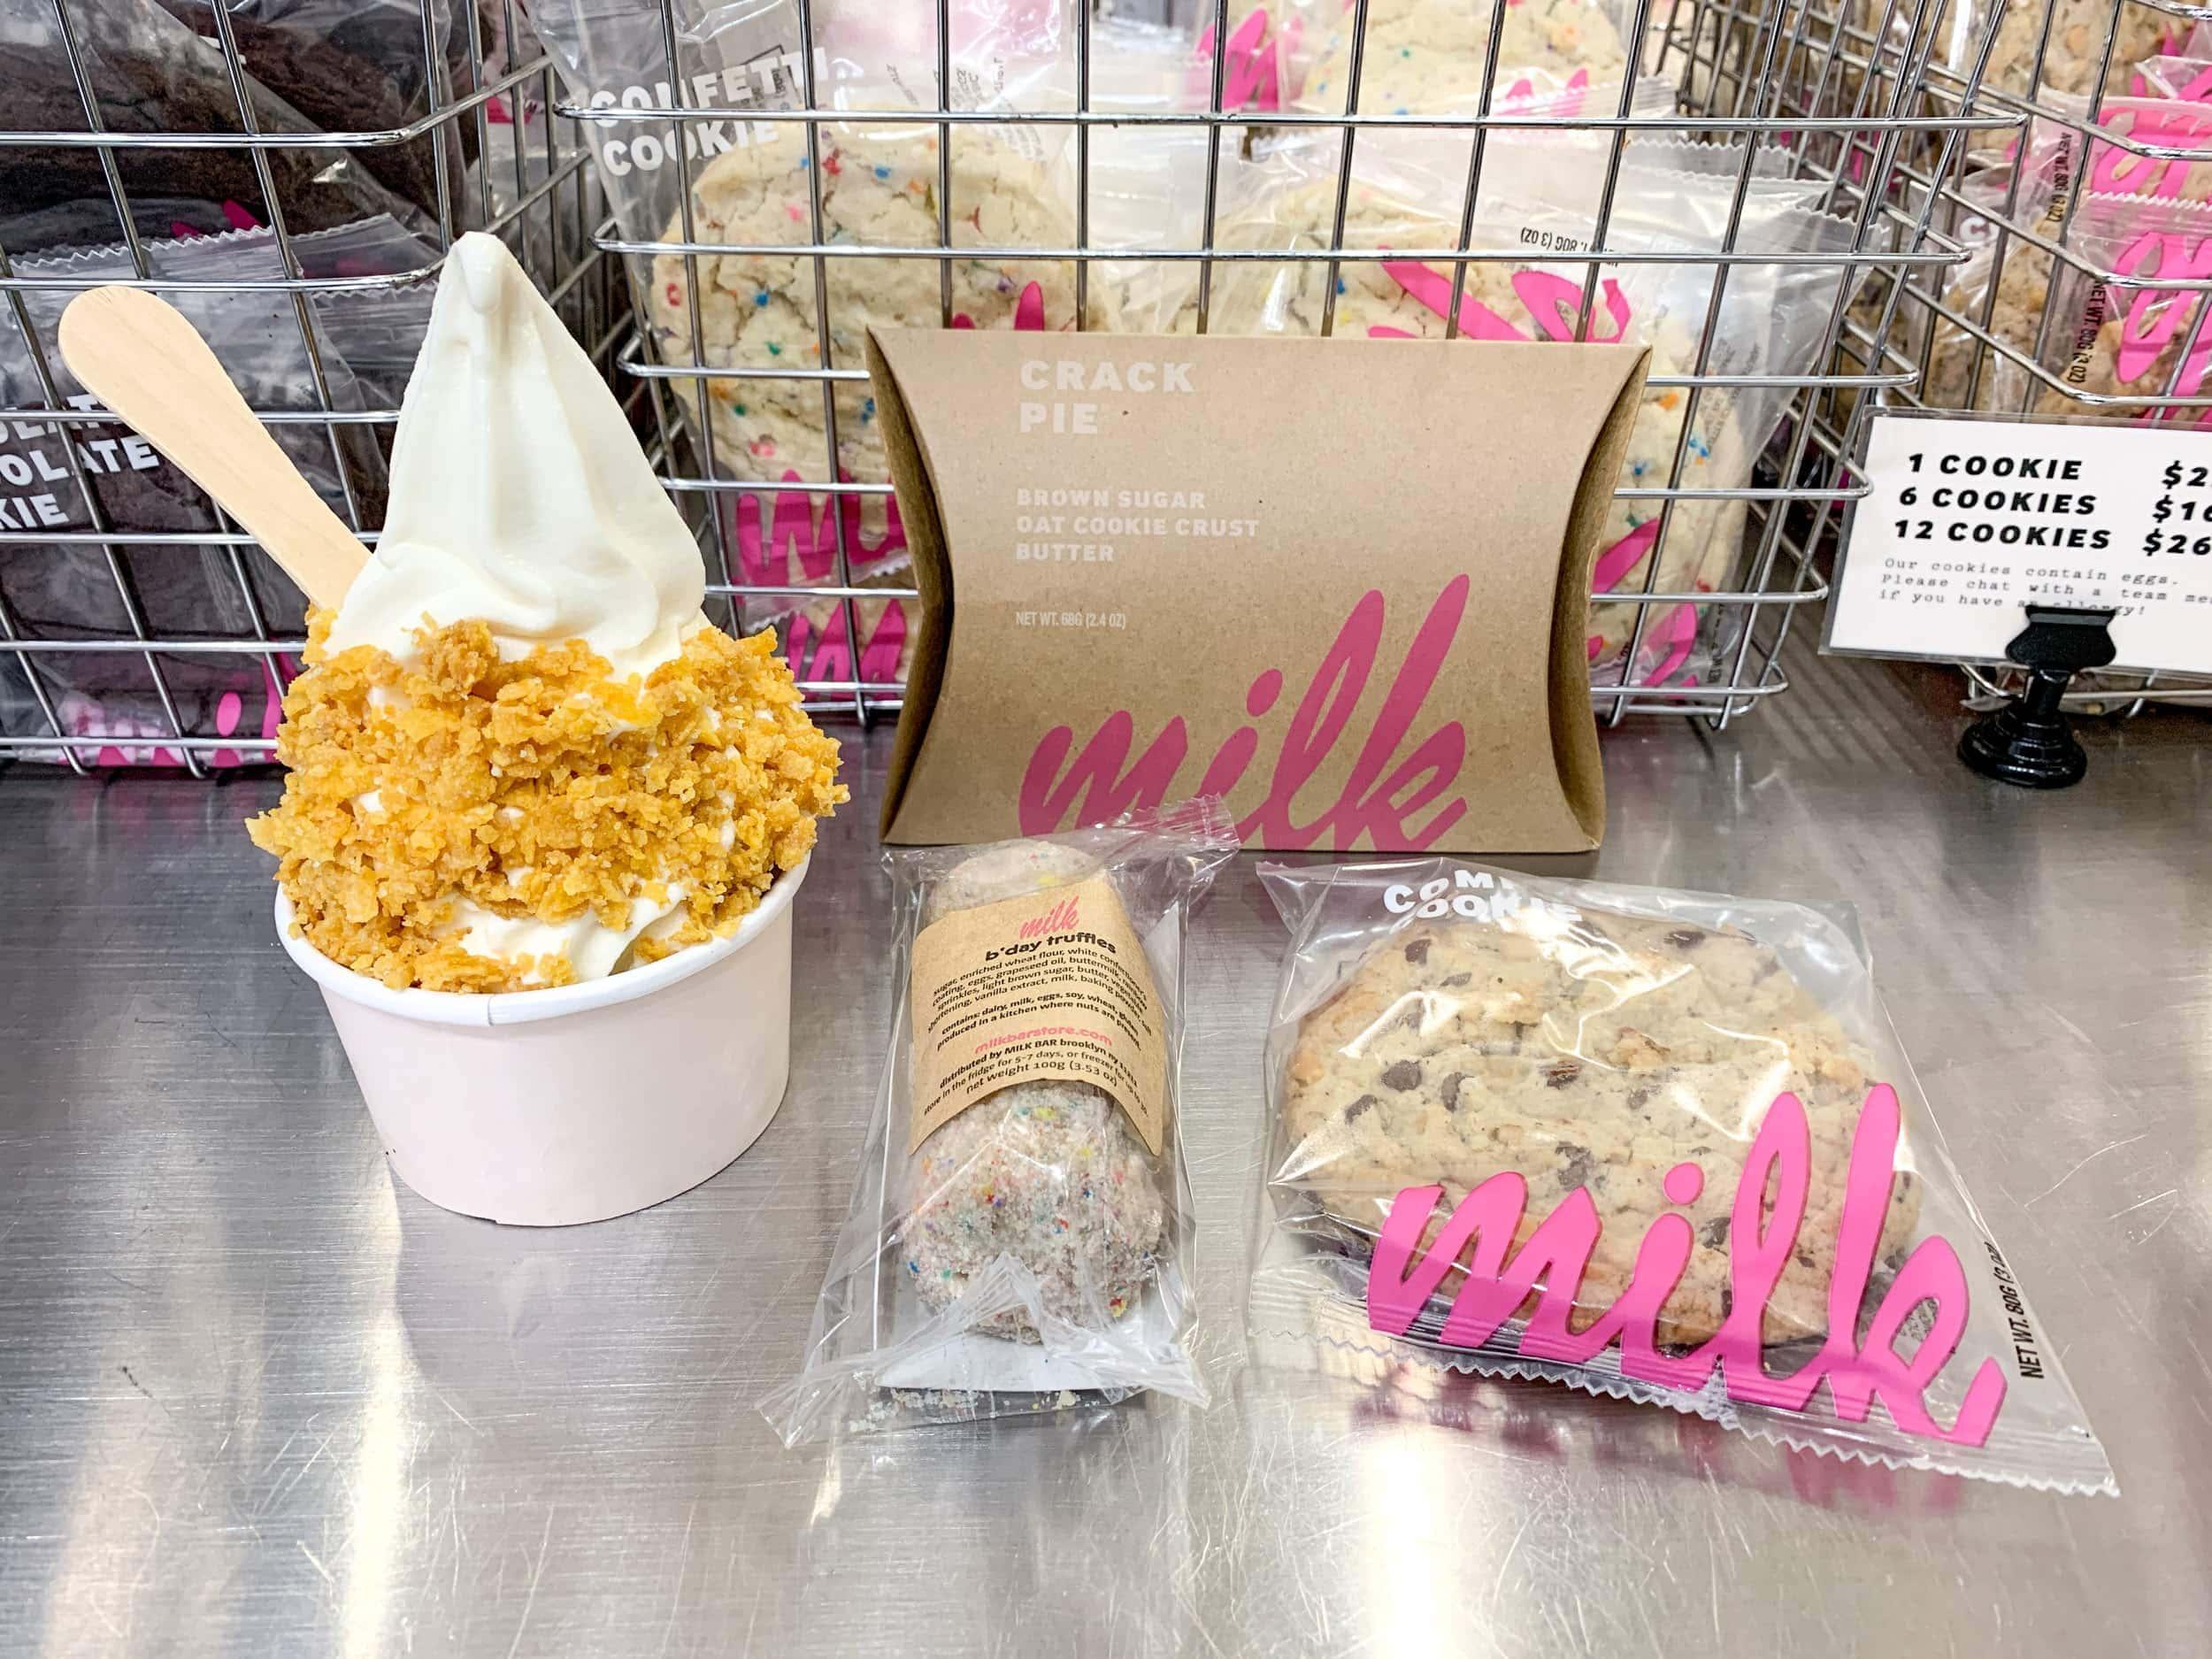 Milk bar ice cream, cake balls, composte cookie, and crack pie